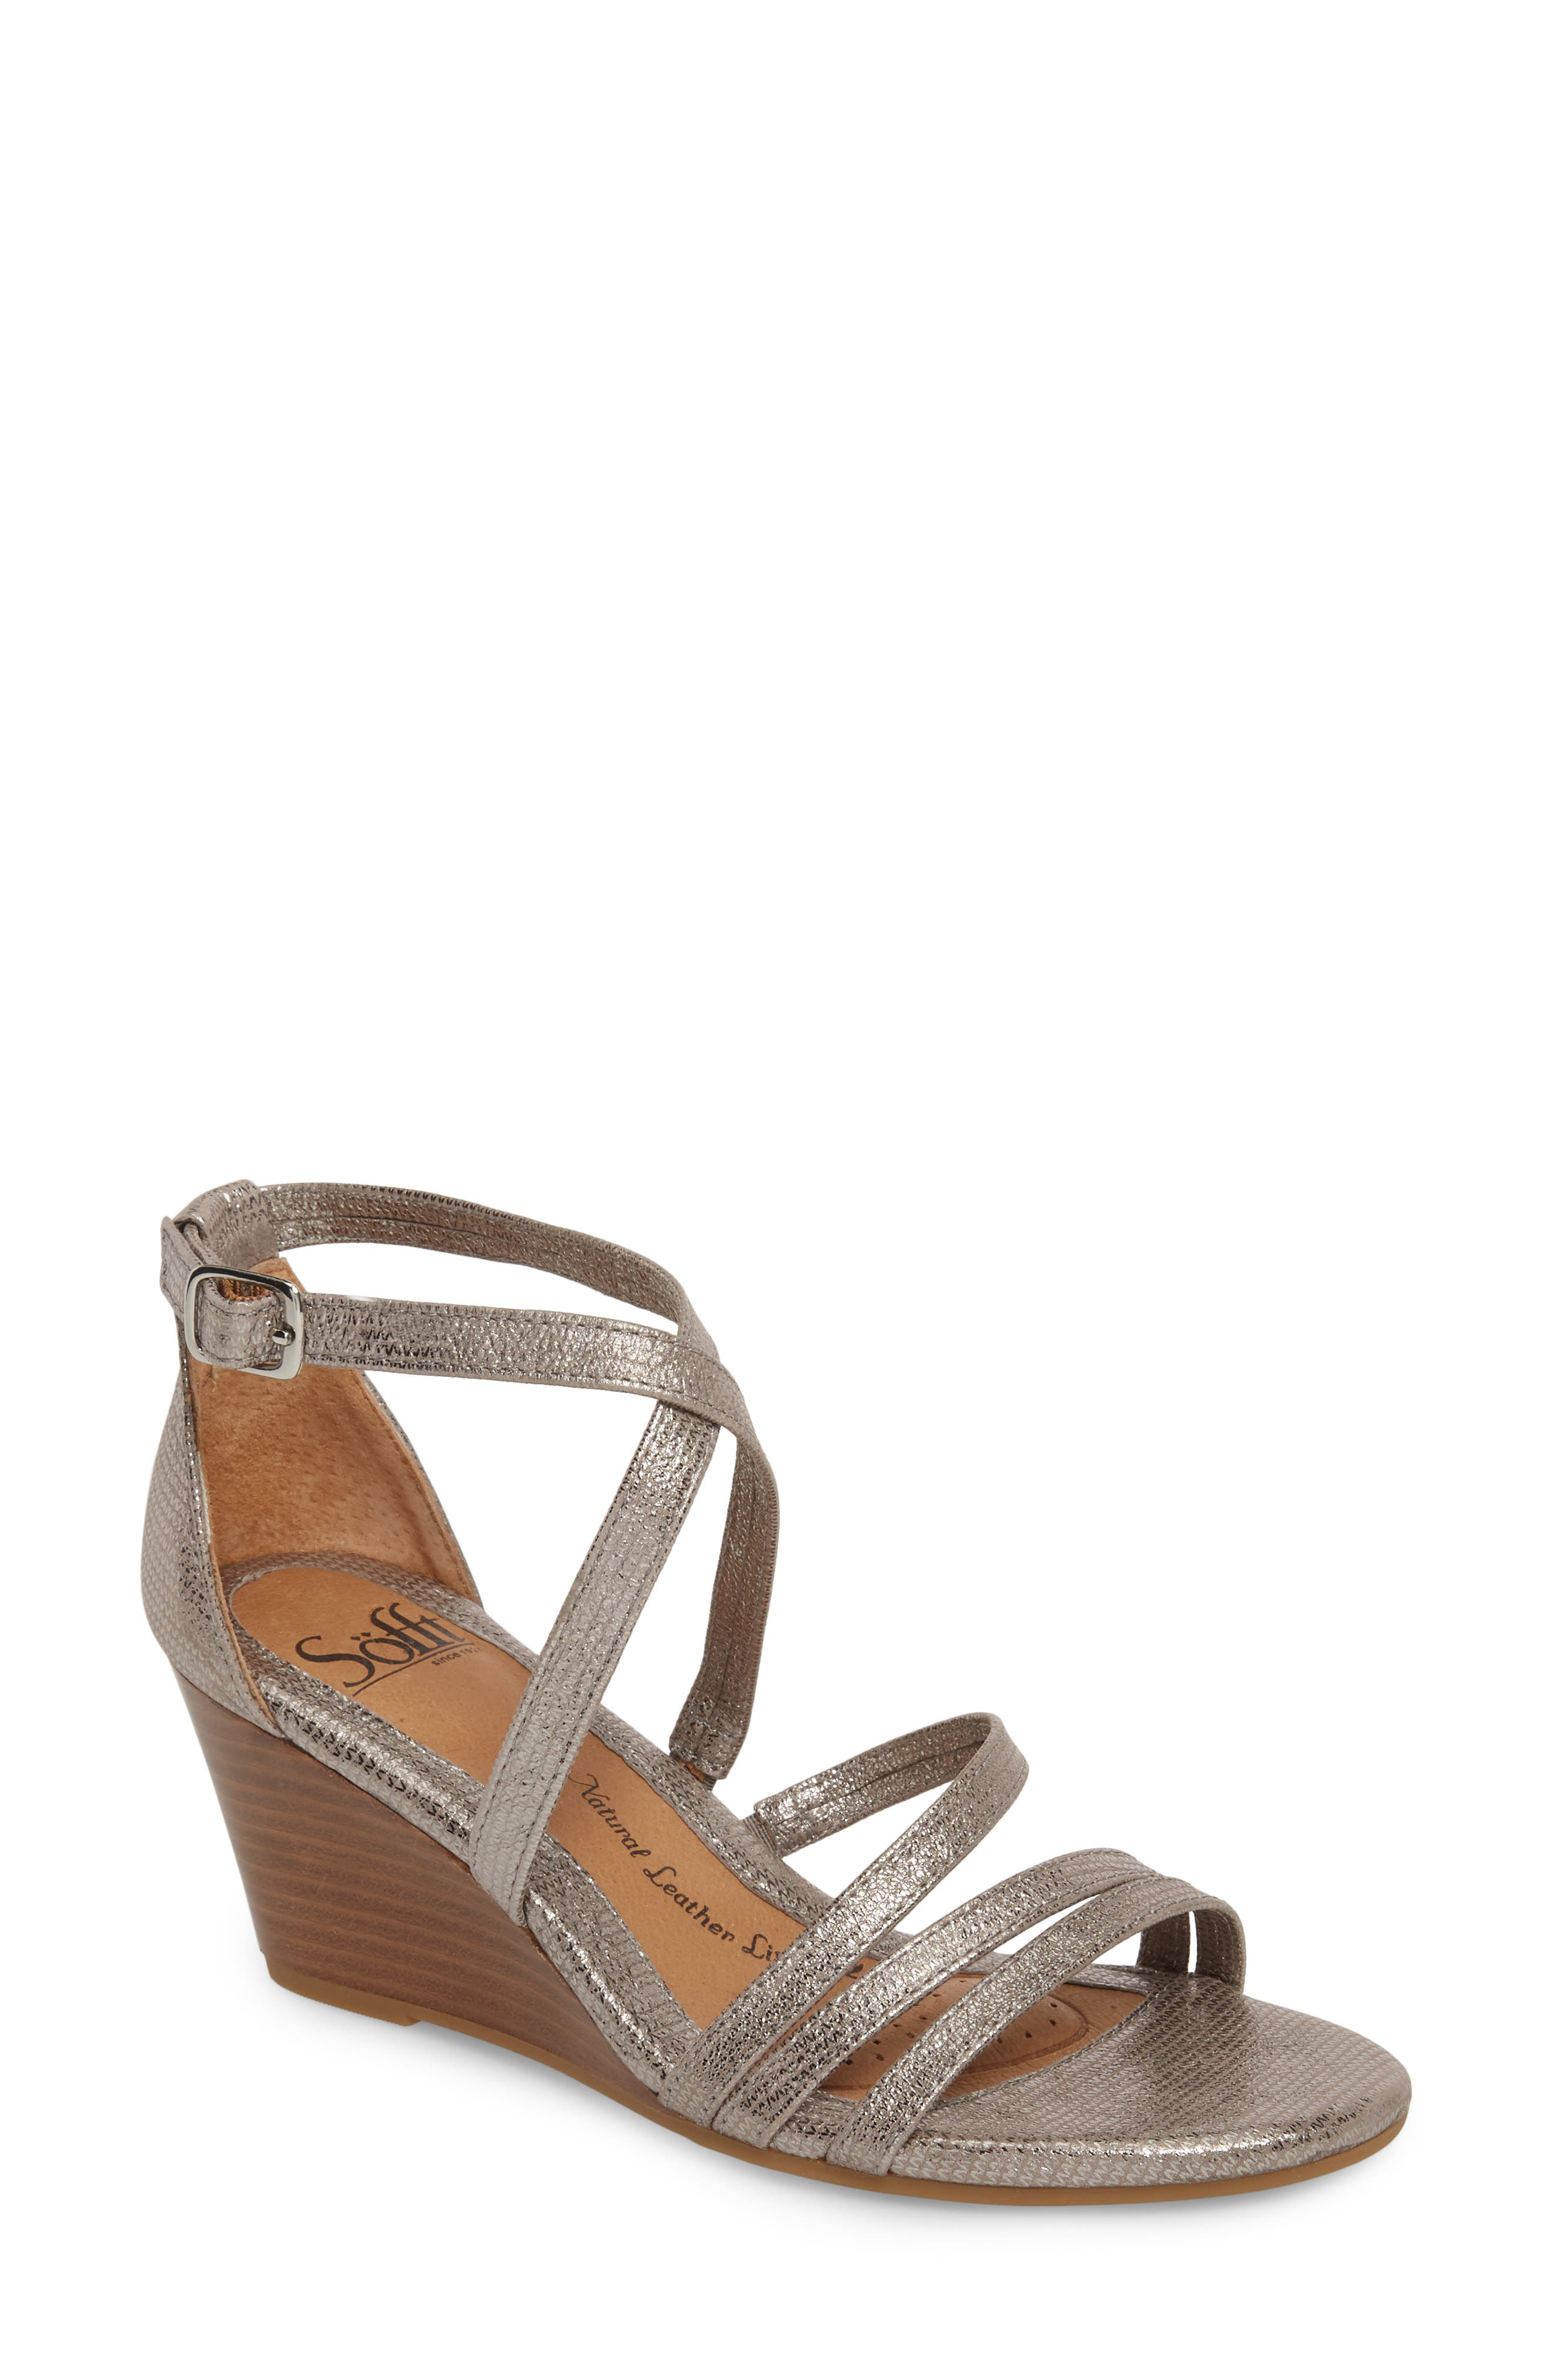 Sofft Mecina Wedge Sandal- Metallic